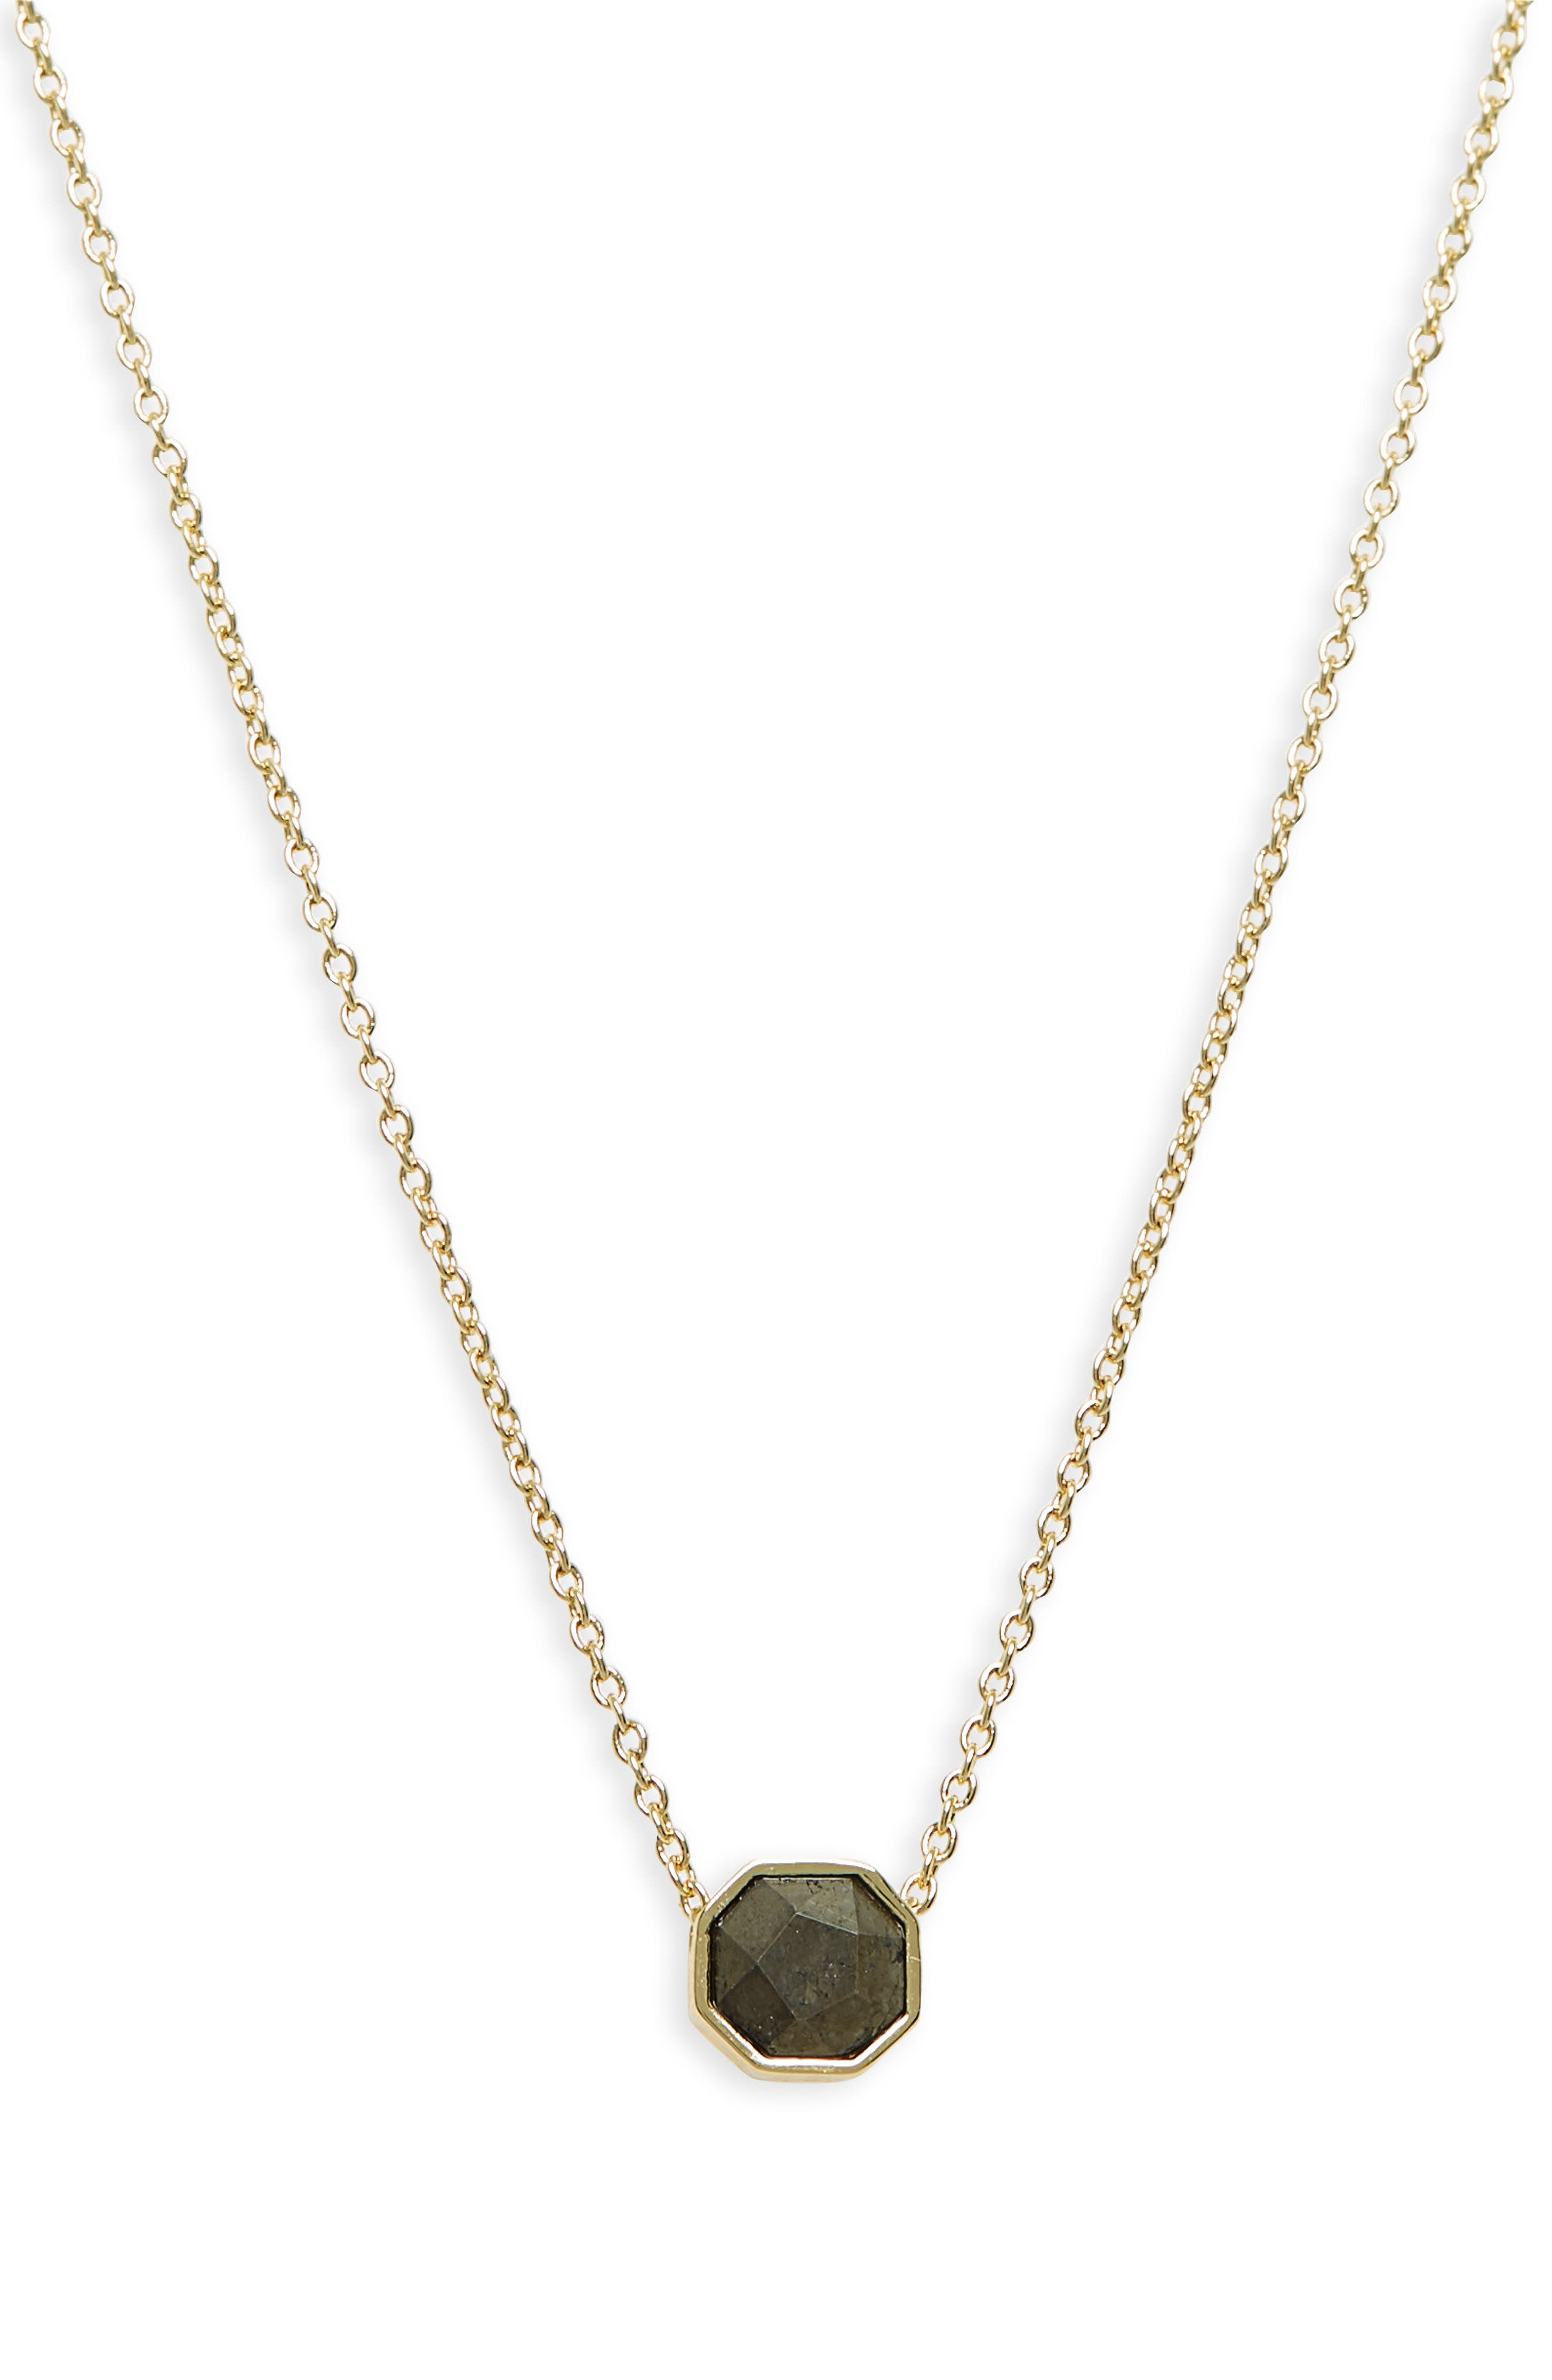 GORJANA, Power Gemstone Charm Adjustable Necklace, Alternate thumbnail 2, color, STRENGTH/ PYRITE/ GOLD